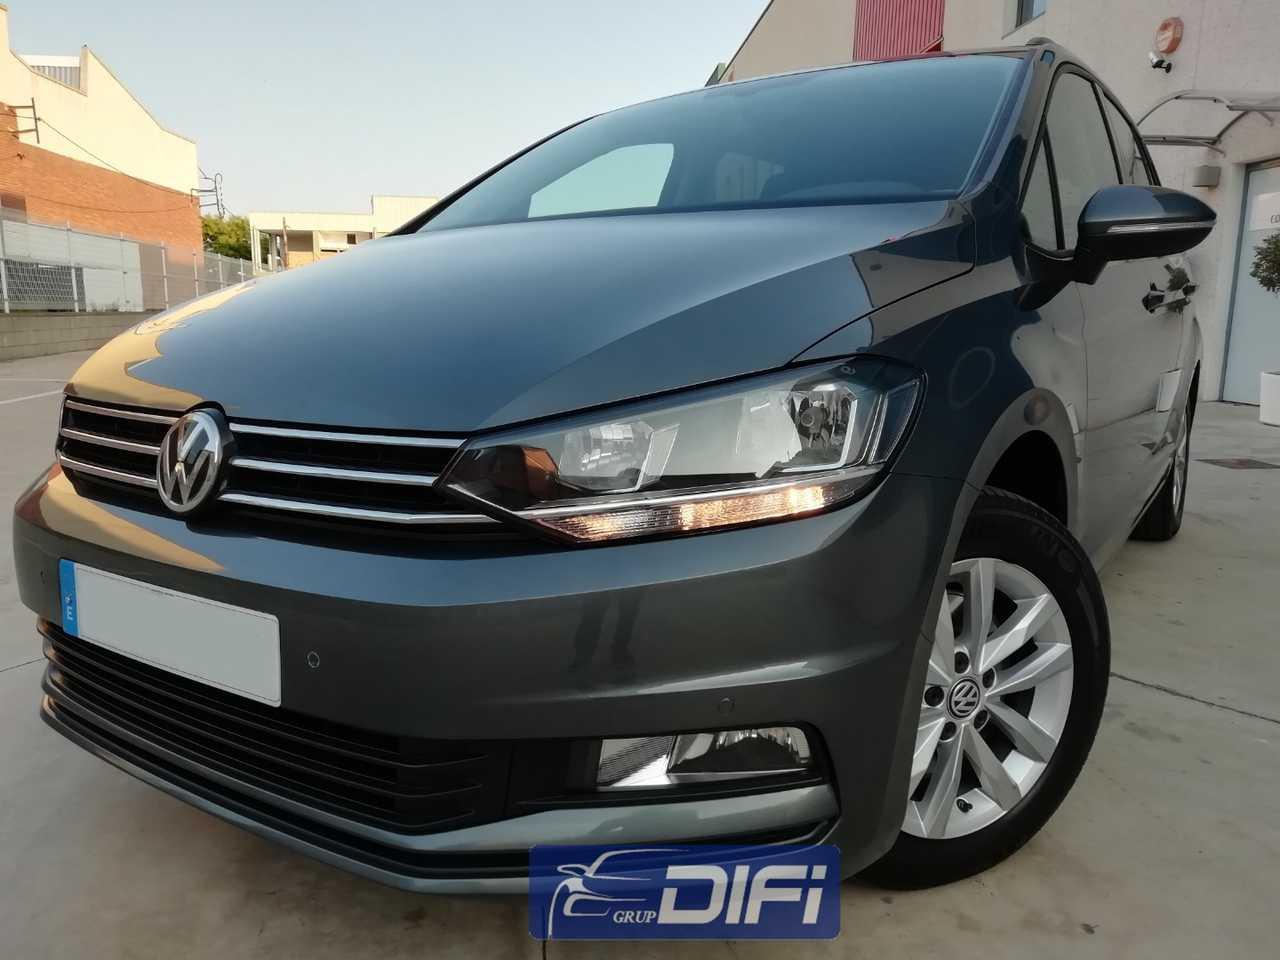 Volkswagen Touran 1.6 TDI 110CV ADVANCE DSG 7 PLA.   - Foto 1